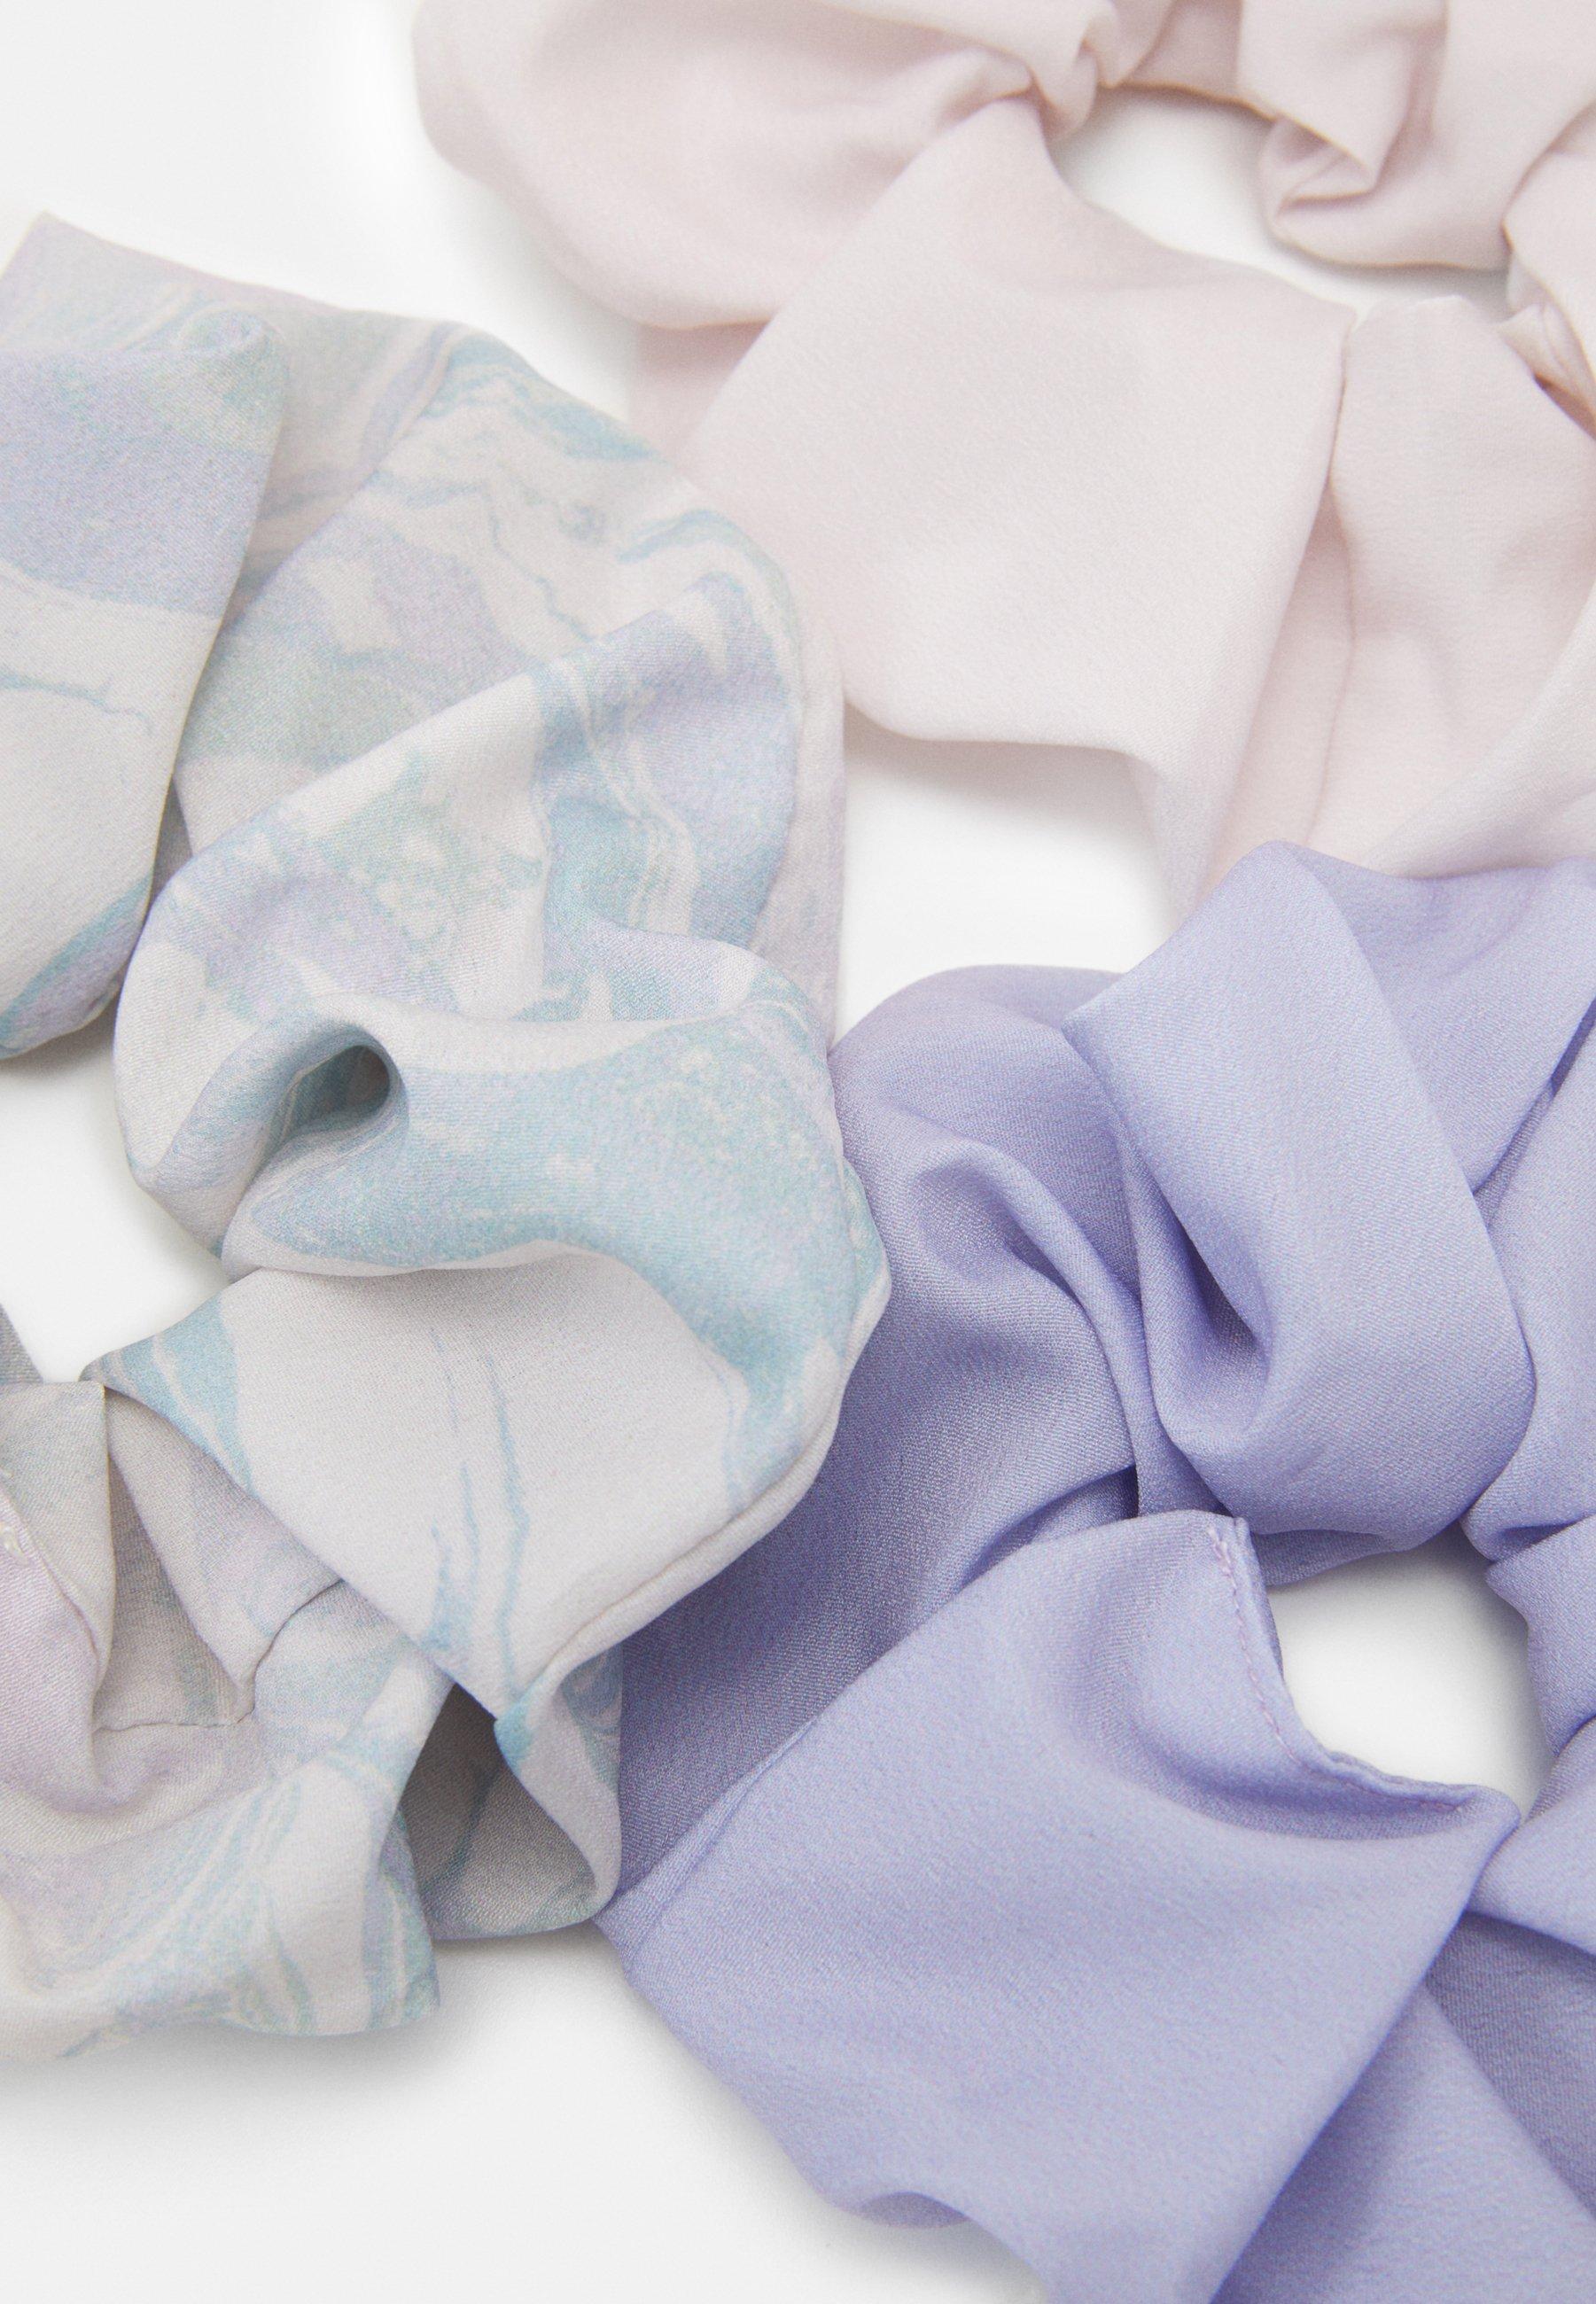 Weekday SCRUNCHIE 3 PACK - Hair Styling Accessory - purple marble/svart 34p8WXkOUUzUUDo